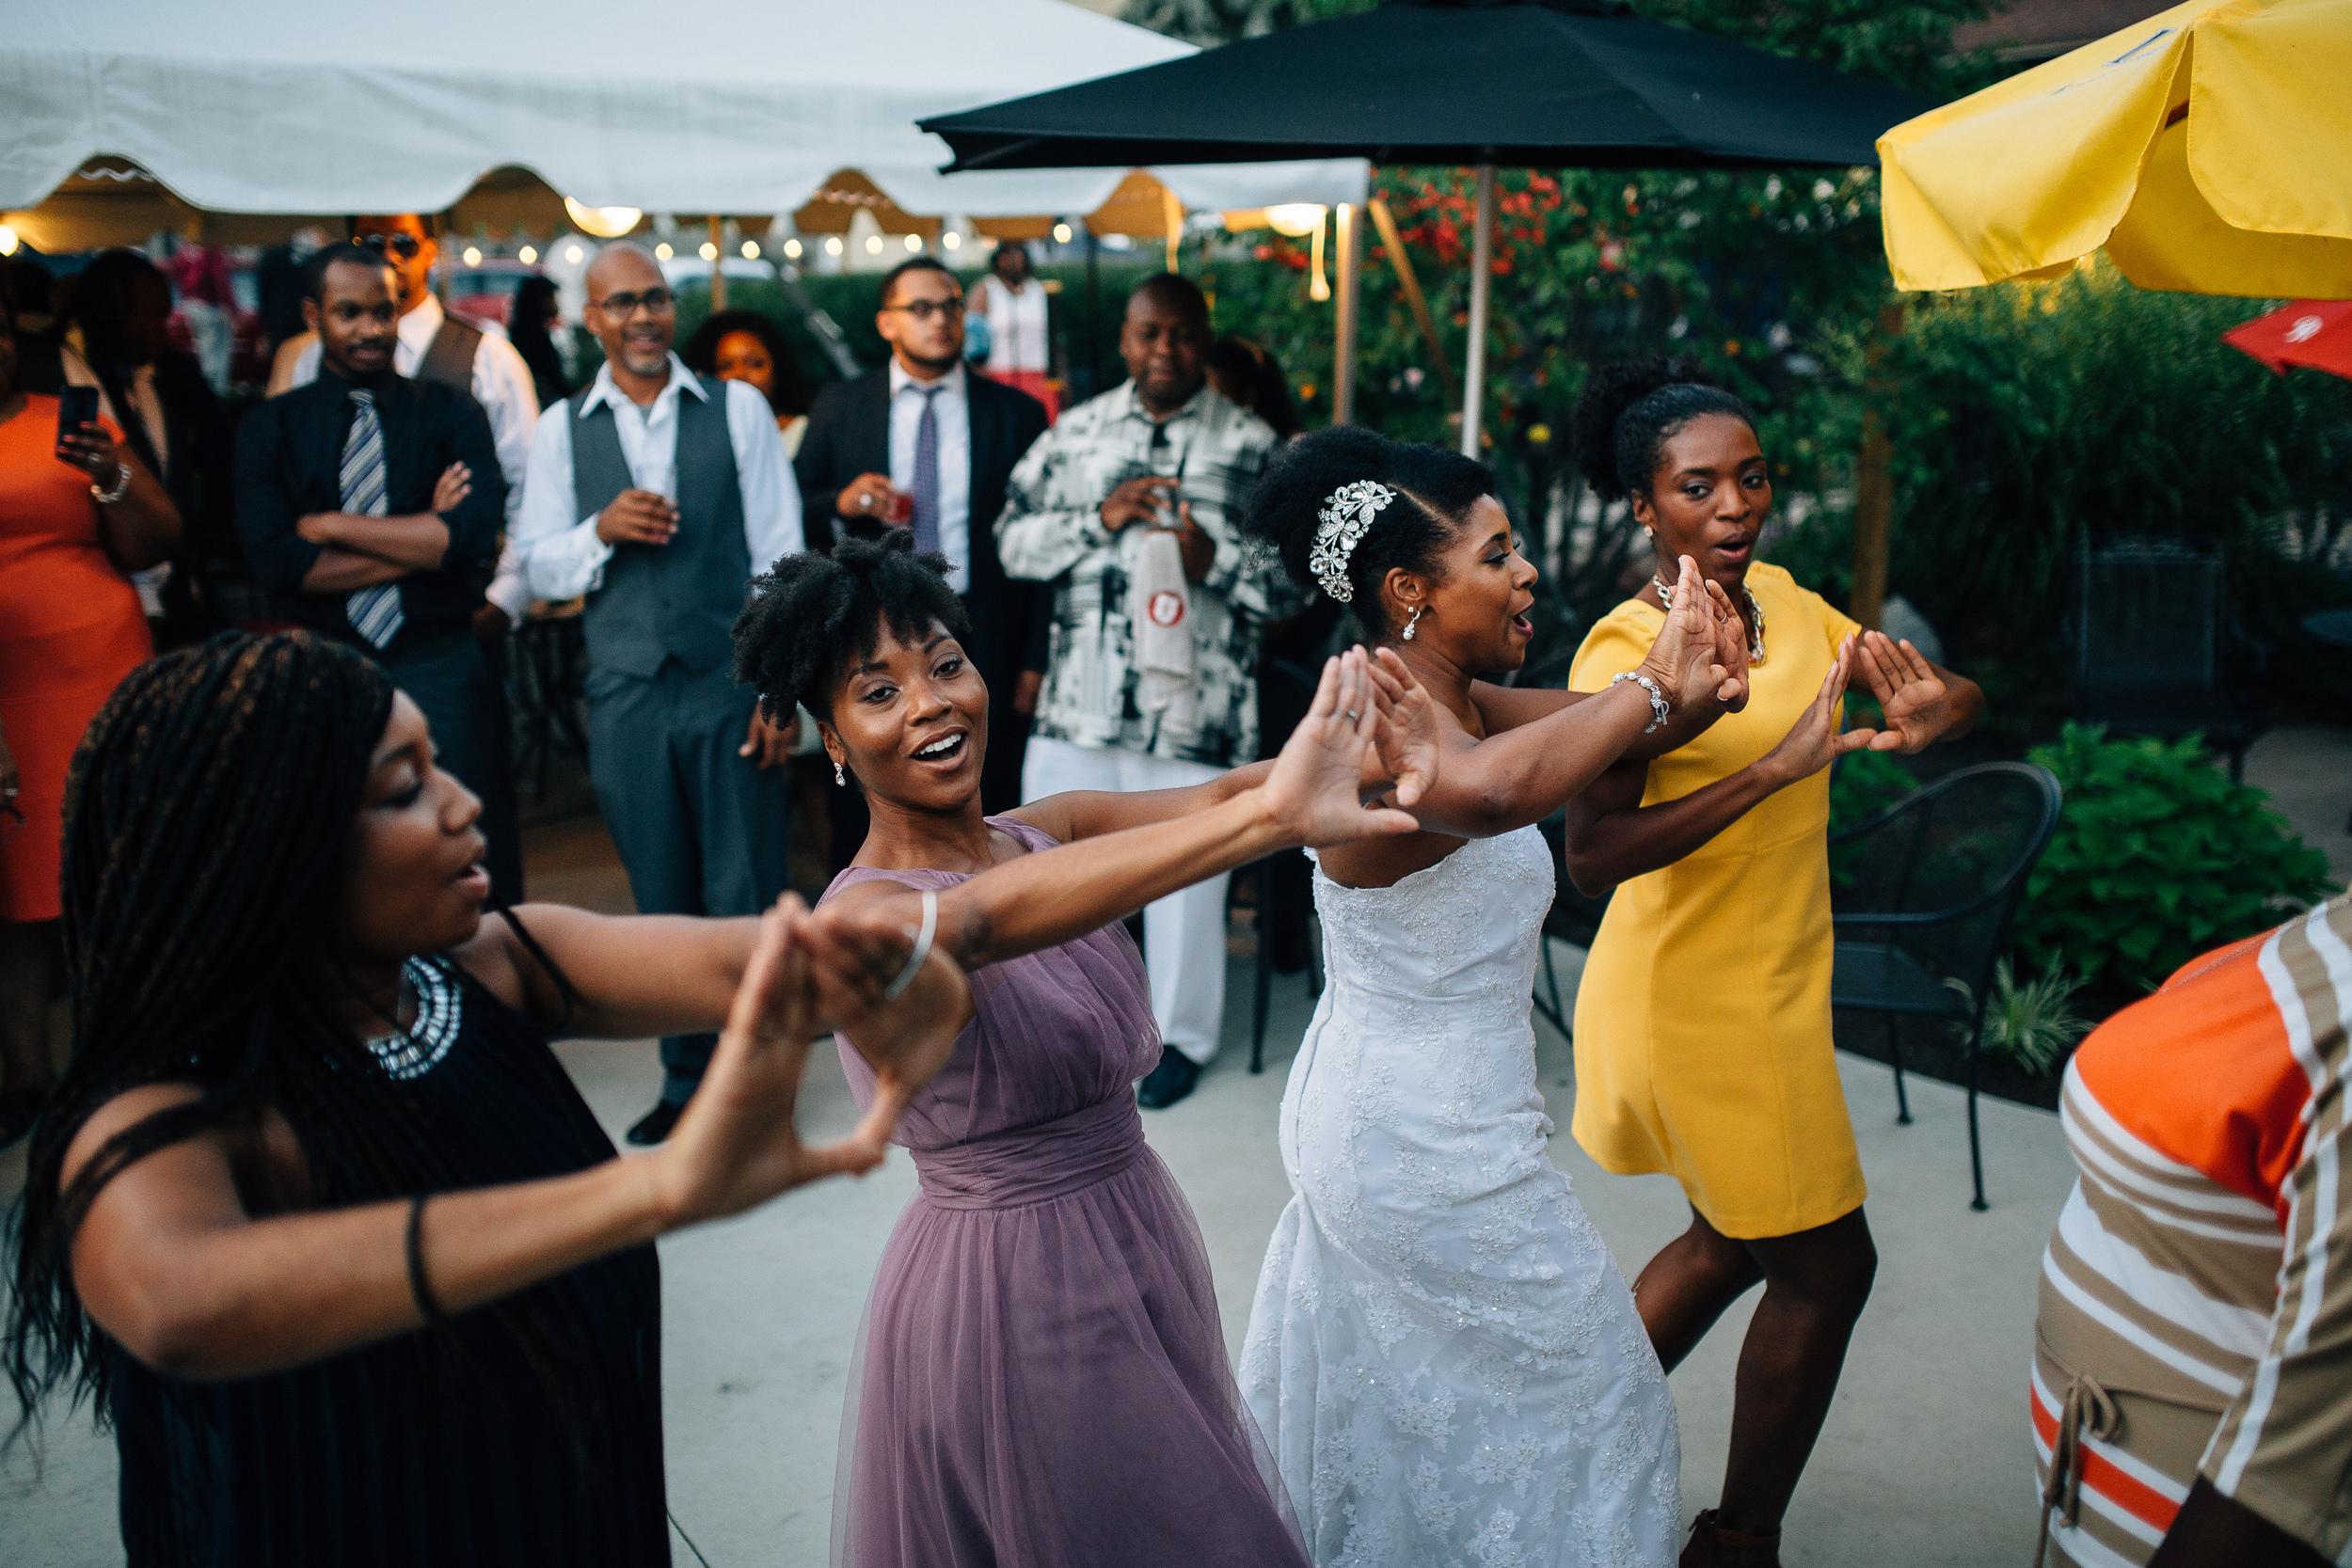 Chuck & Alicia's Wedding - Corrie Mick Photography-756.jpg